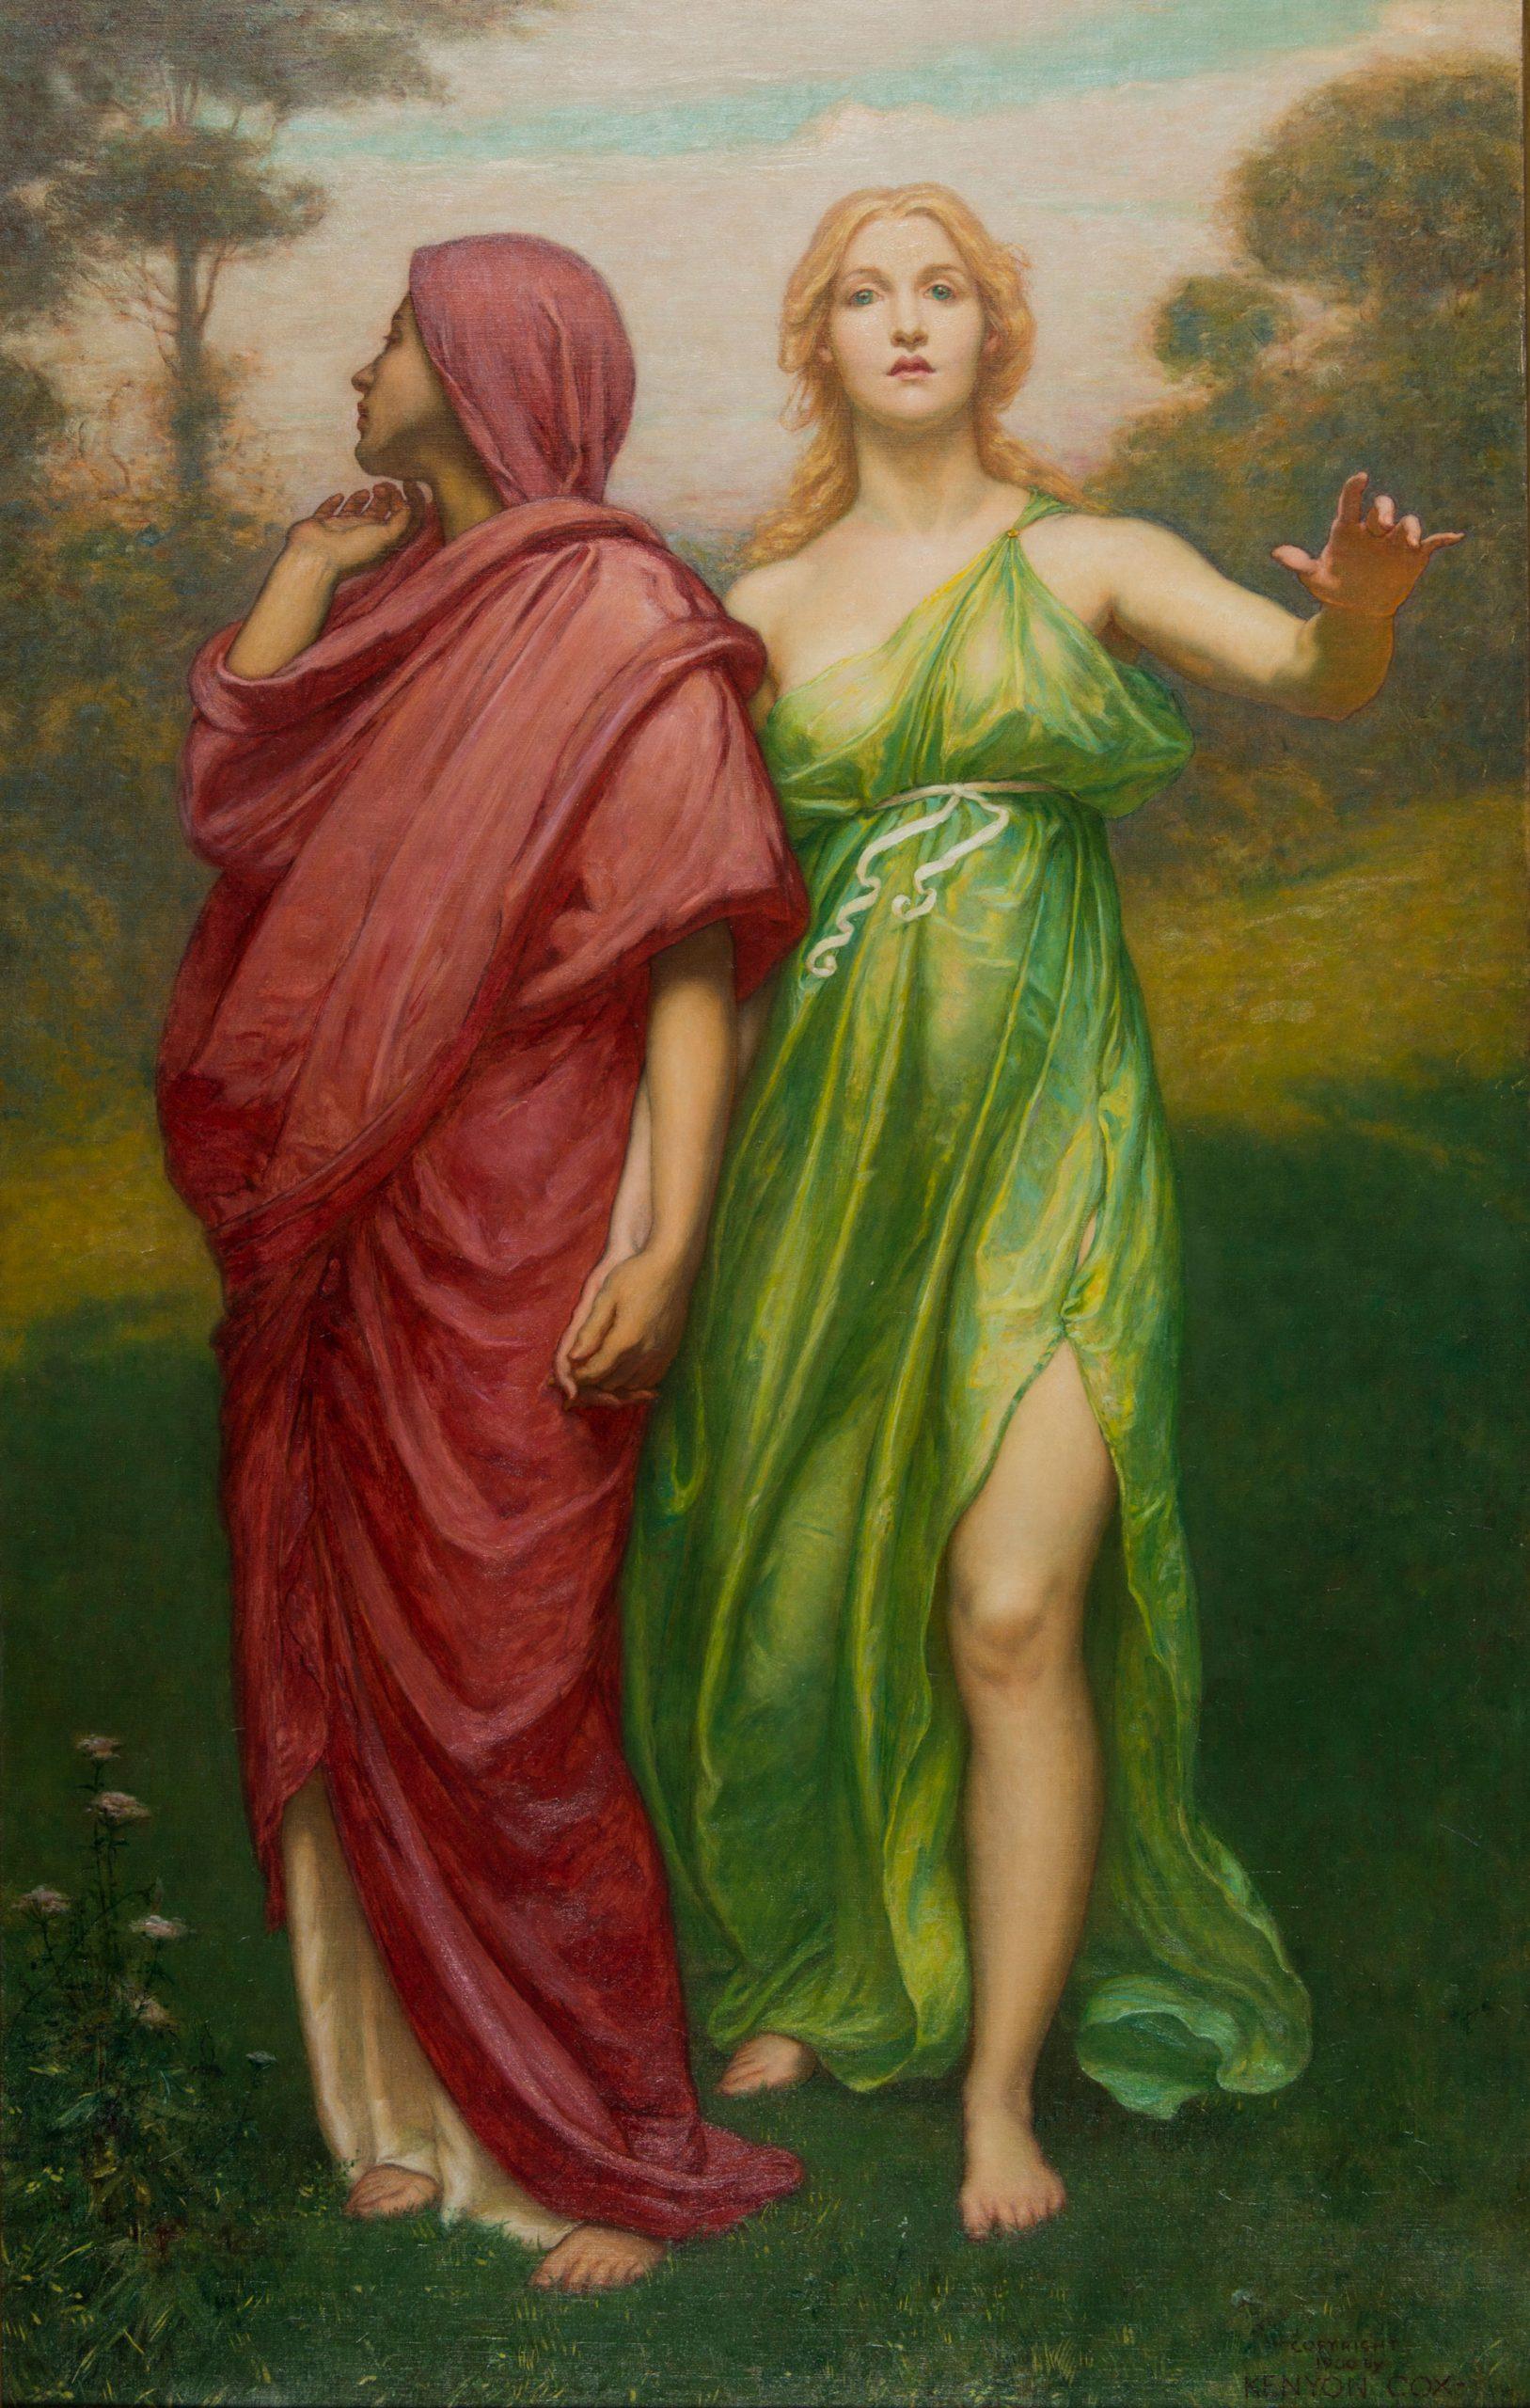 Two women walking forward, one looks behind her.